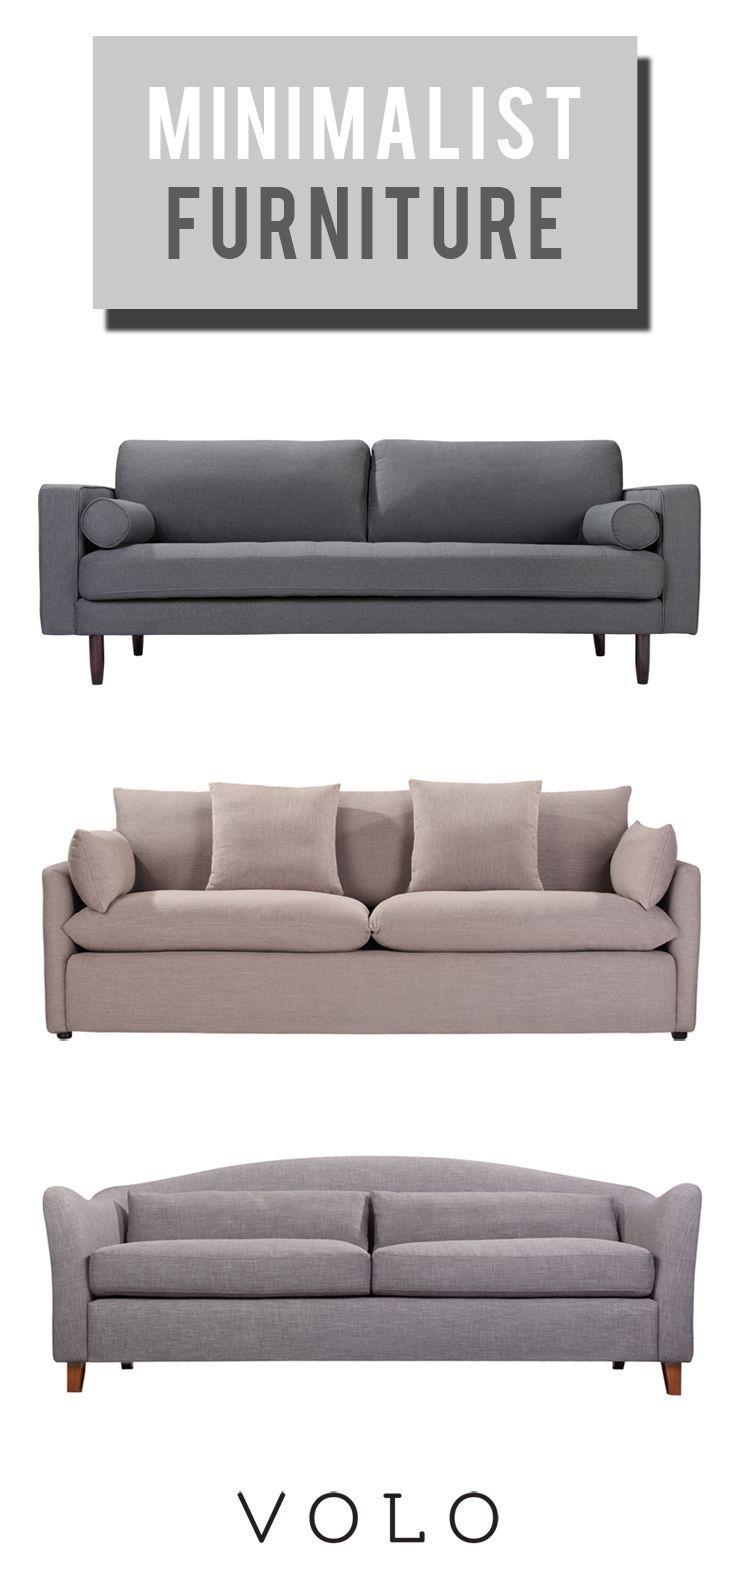 The 25+ Best Minimalist Furniture Ideas On Pinterest | Smart Furniture,  Minimalist Guest Room Furniture And Furniture Screws